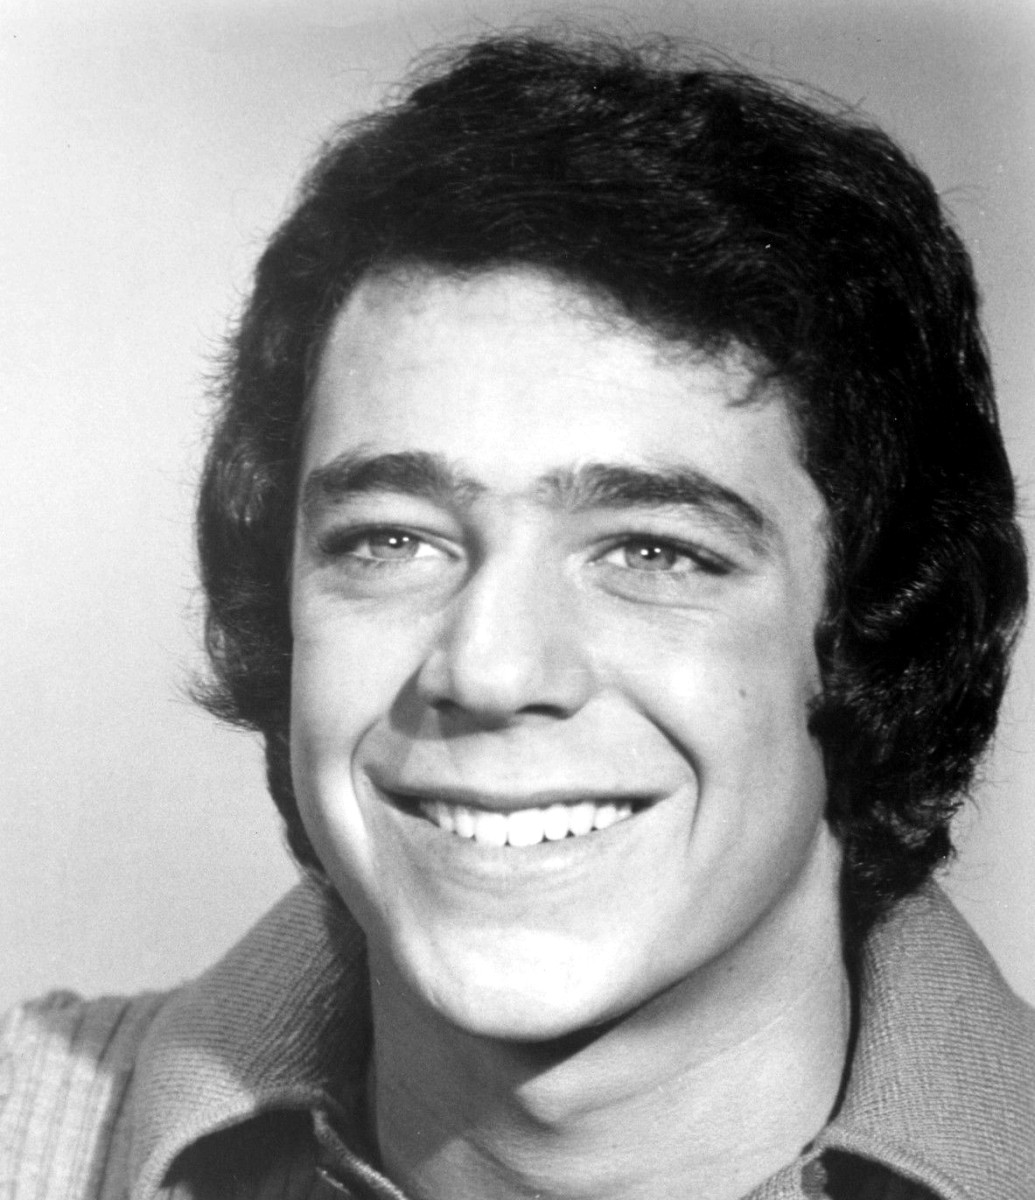 fe428bc1319d 1970s Male Teen Idols